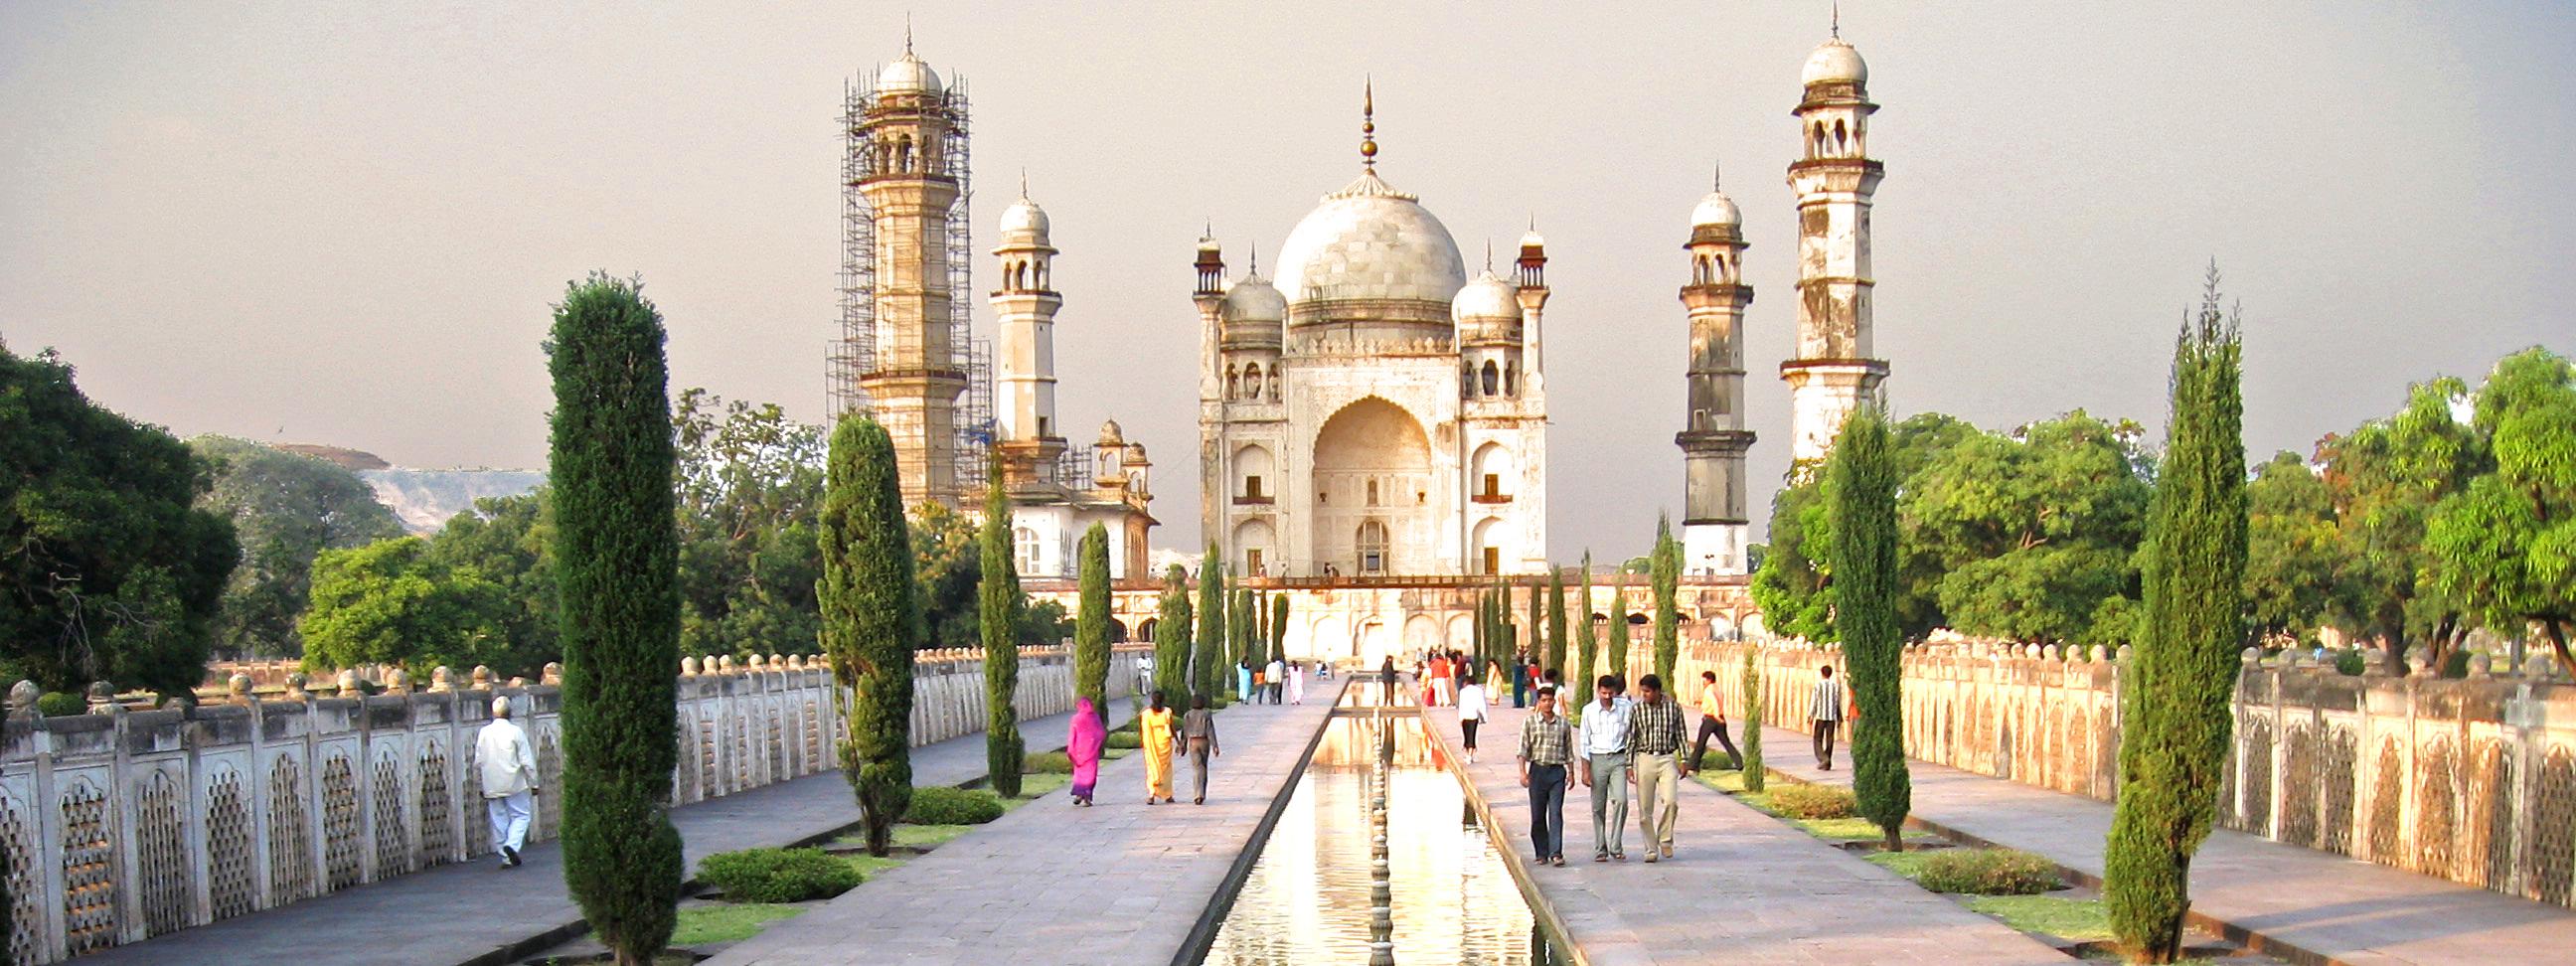 Bibi Ka Maqbara Aurangabad Reviews Information Tourist